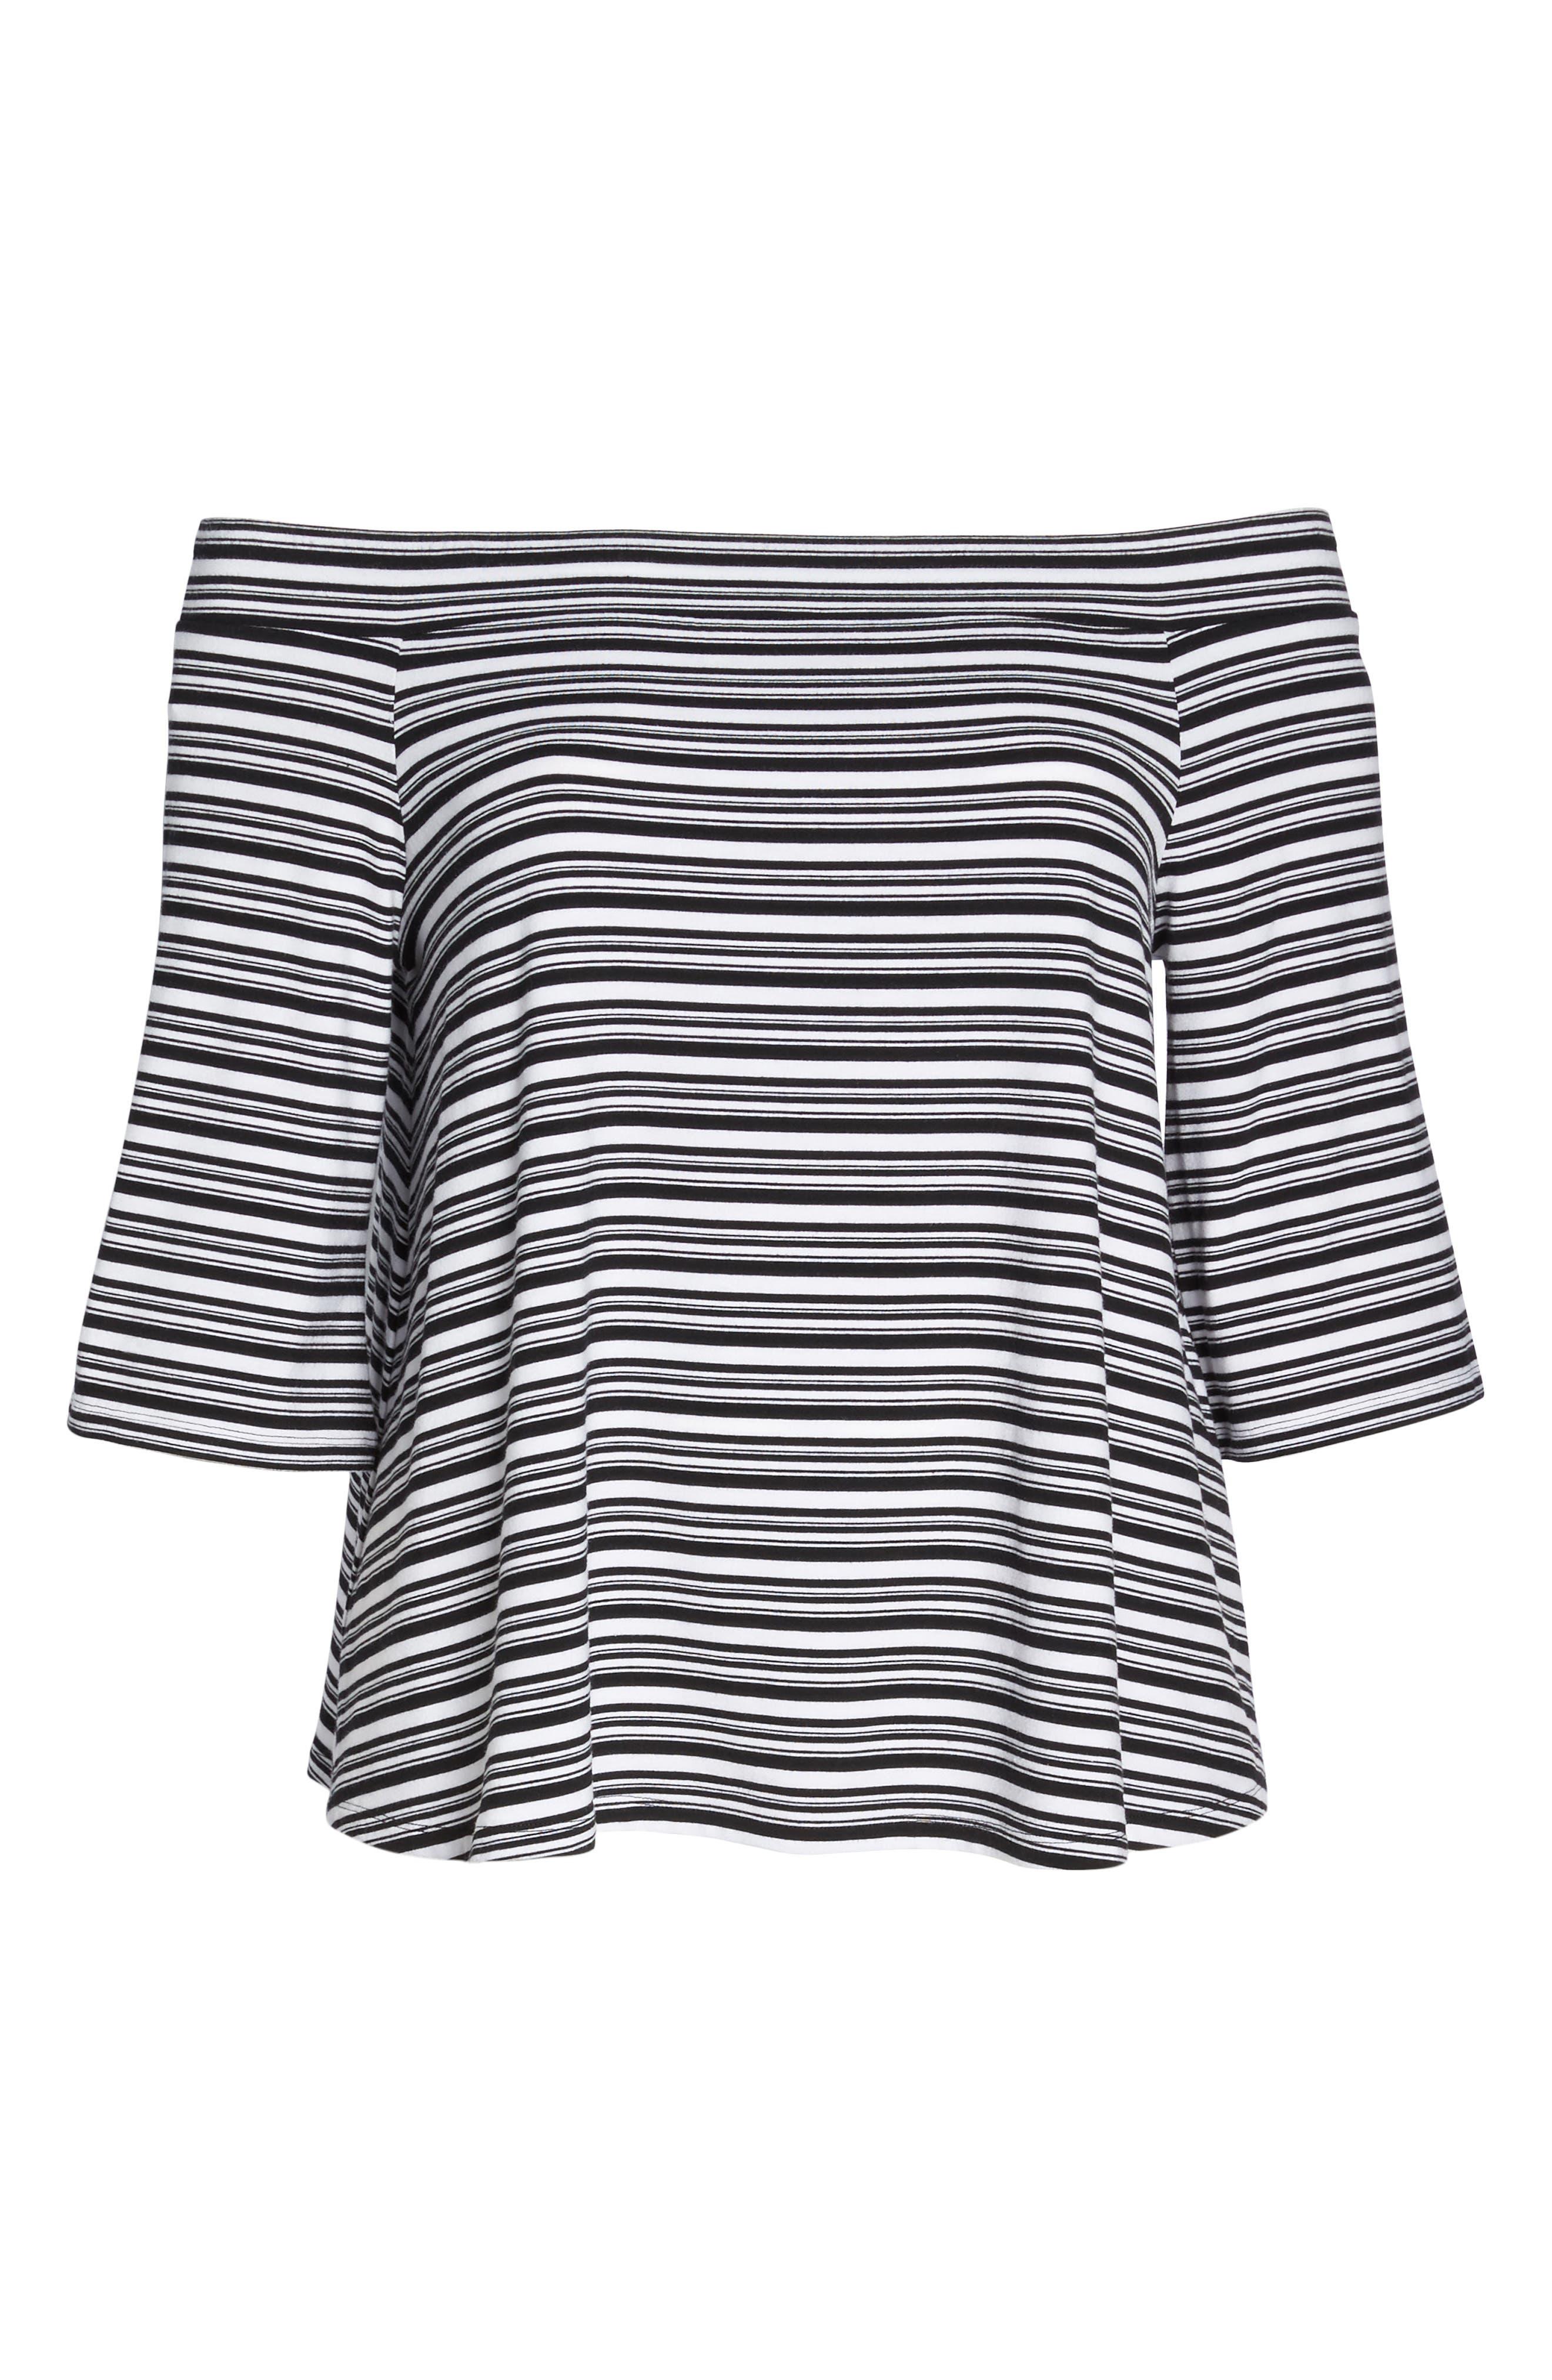 Stripe Off the Shoulder Top,                             Alternate thumbnail 6, color,                             001